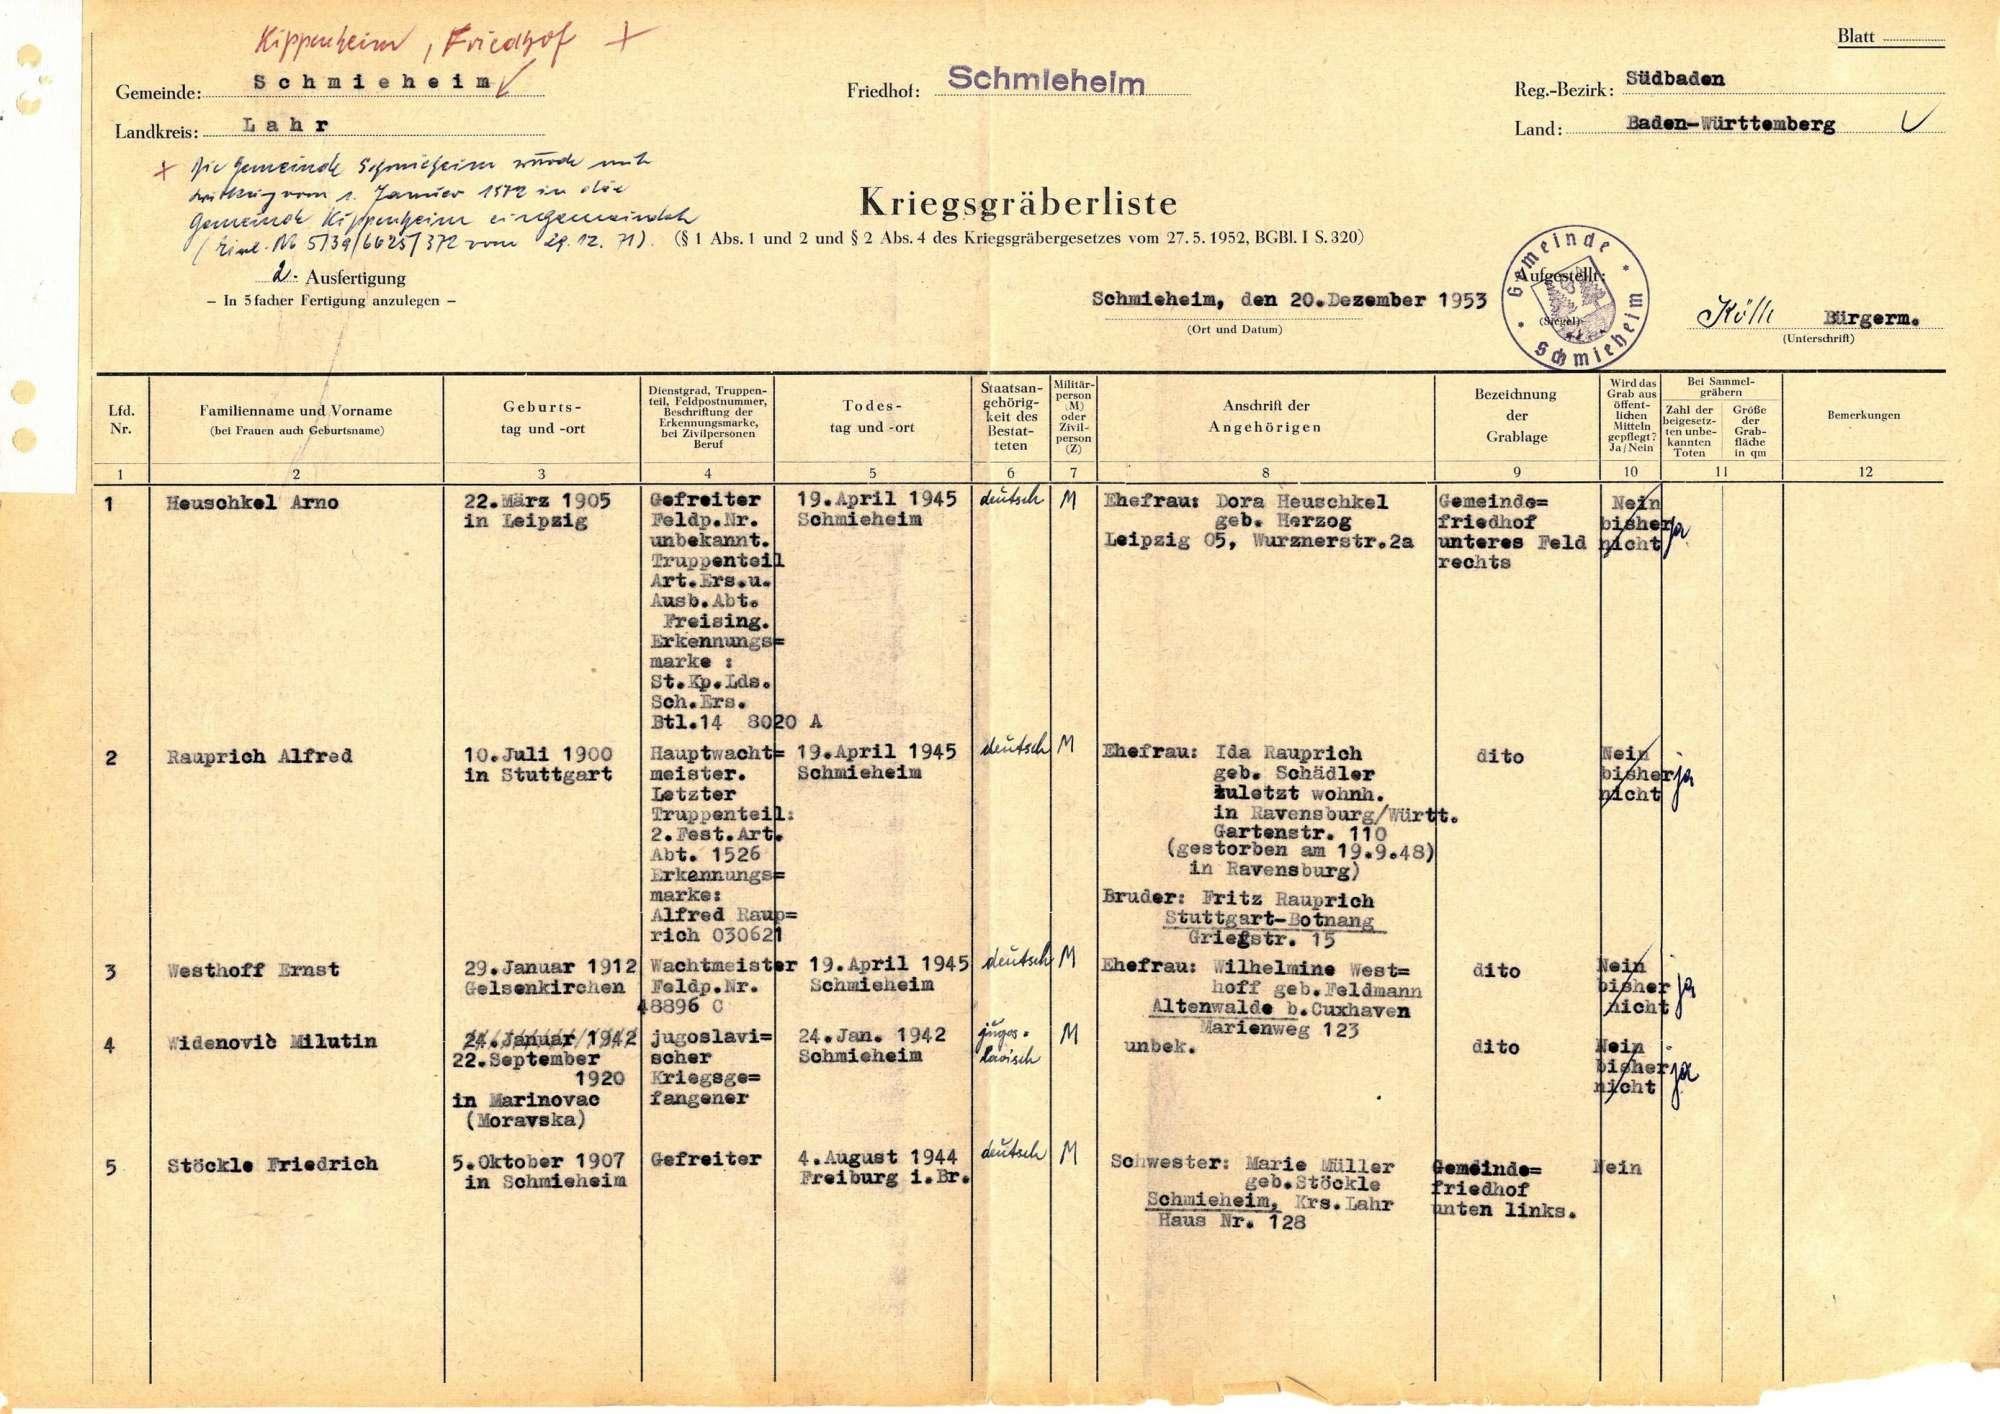 Schmieheim, Bild 1